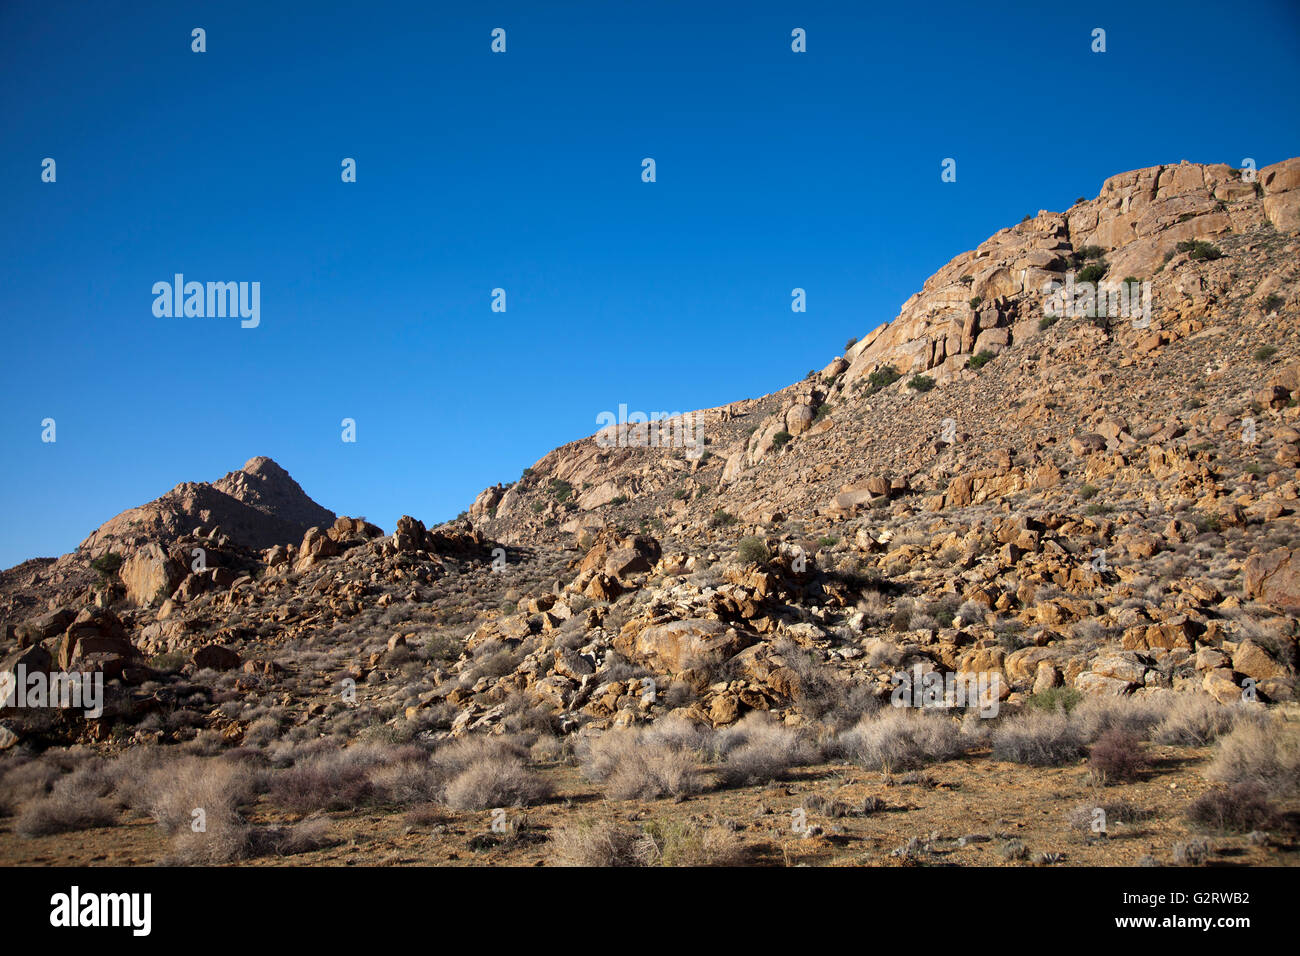 Klein Aus Vista Landscape in Namibia - Stock Image